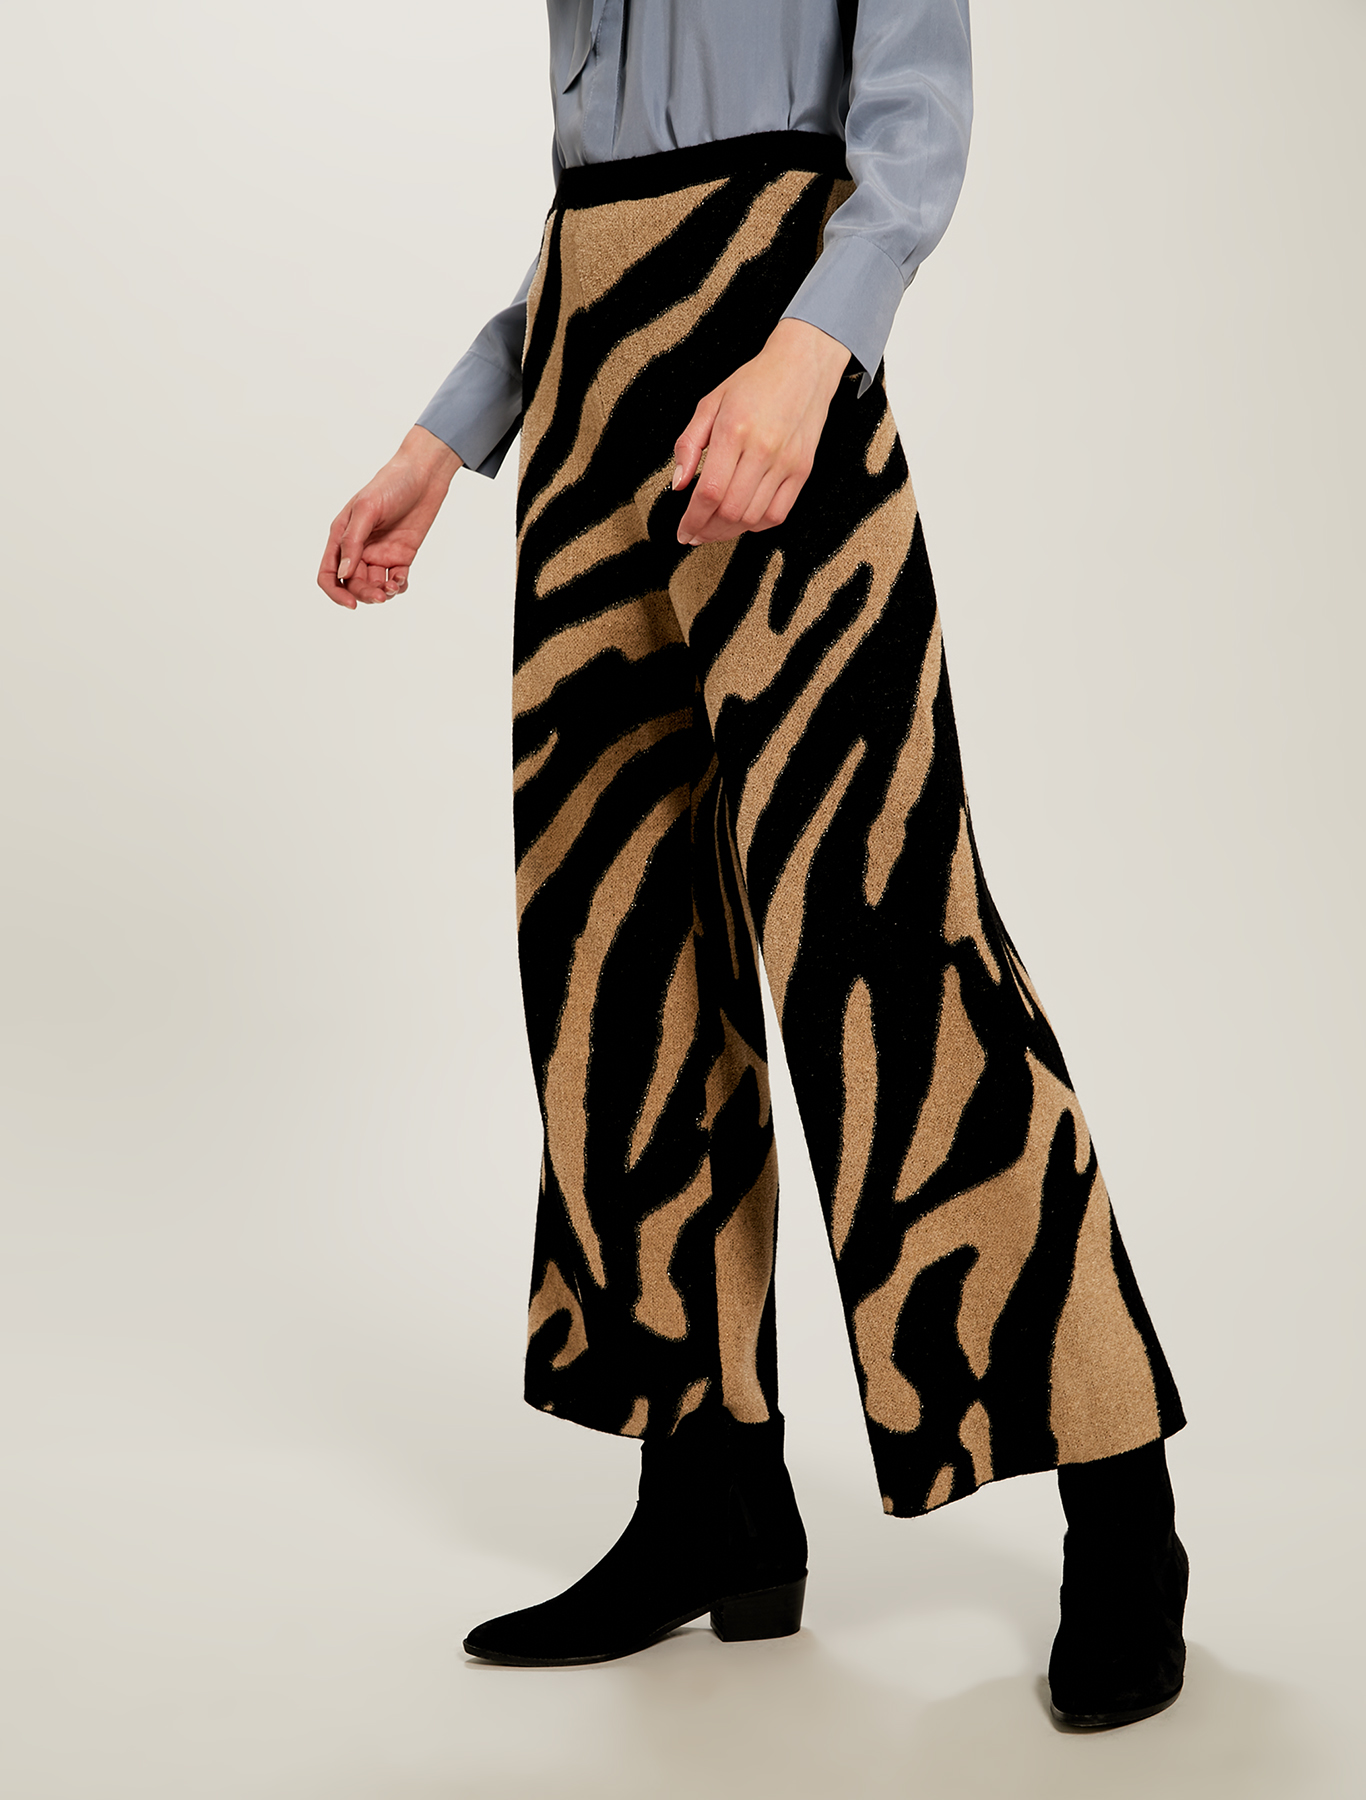 Pantaloni in maglia animalier - fantasia cammello - pennyblack